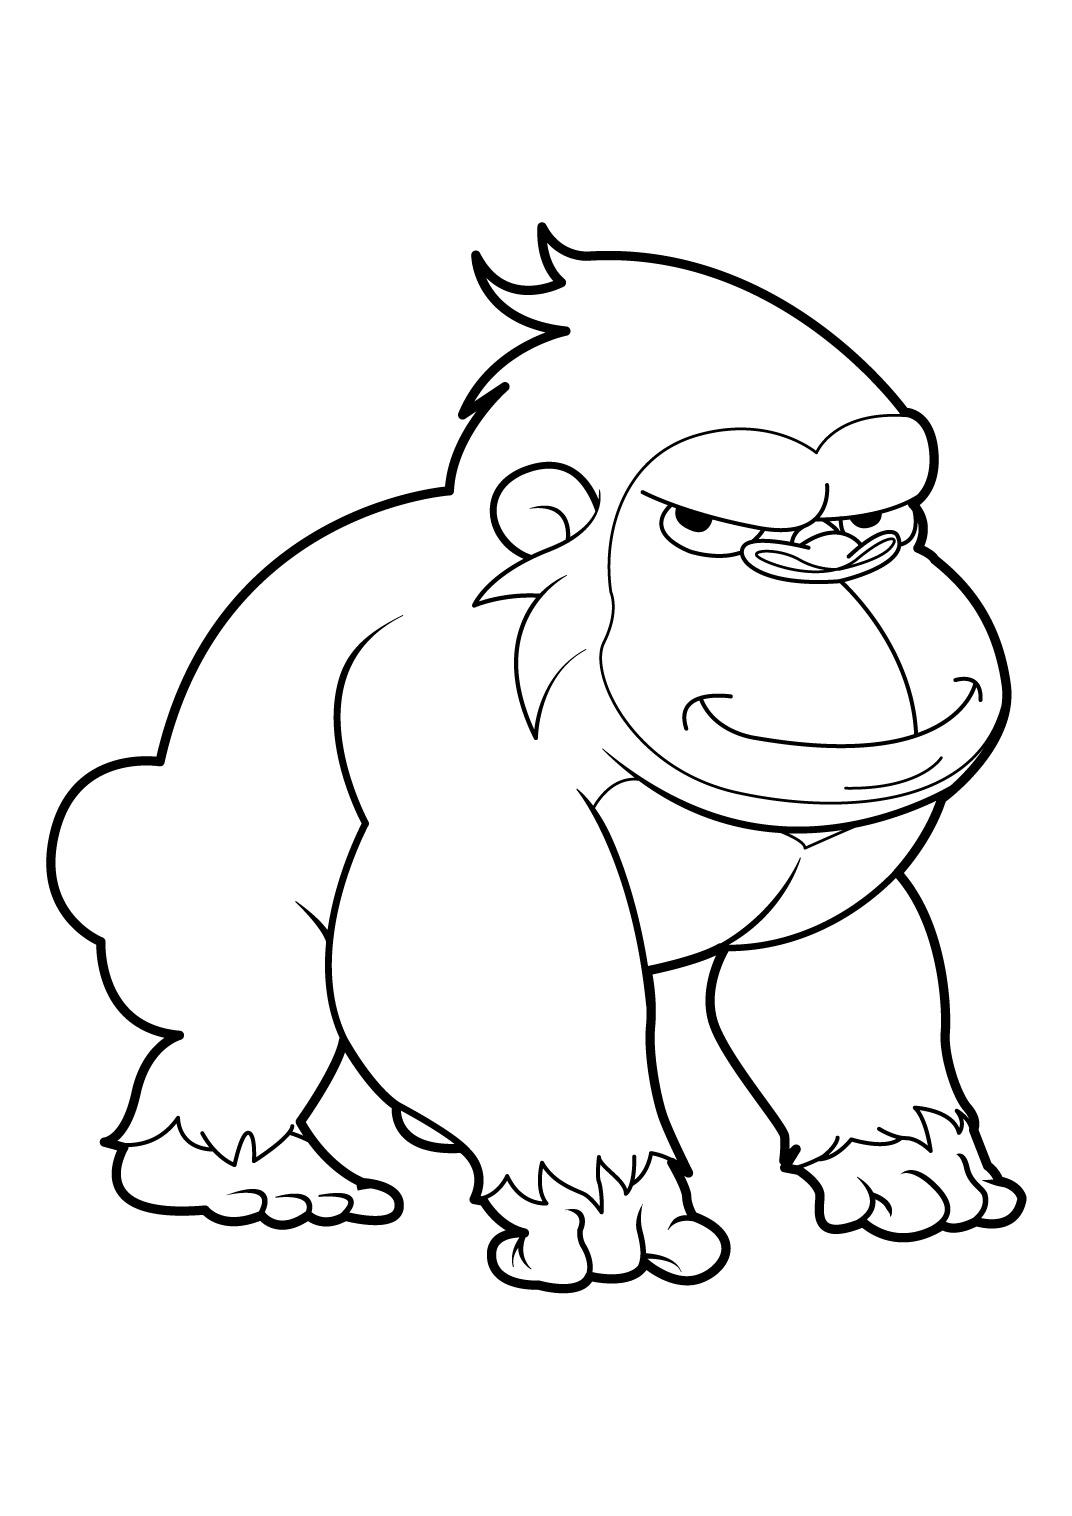 Coloriage un singe - Imprimer dessin ...